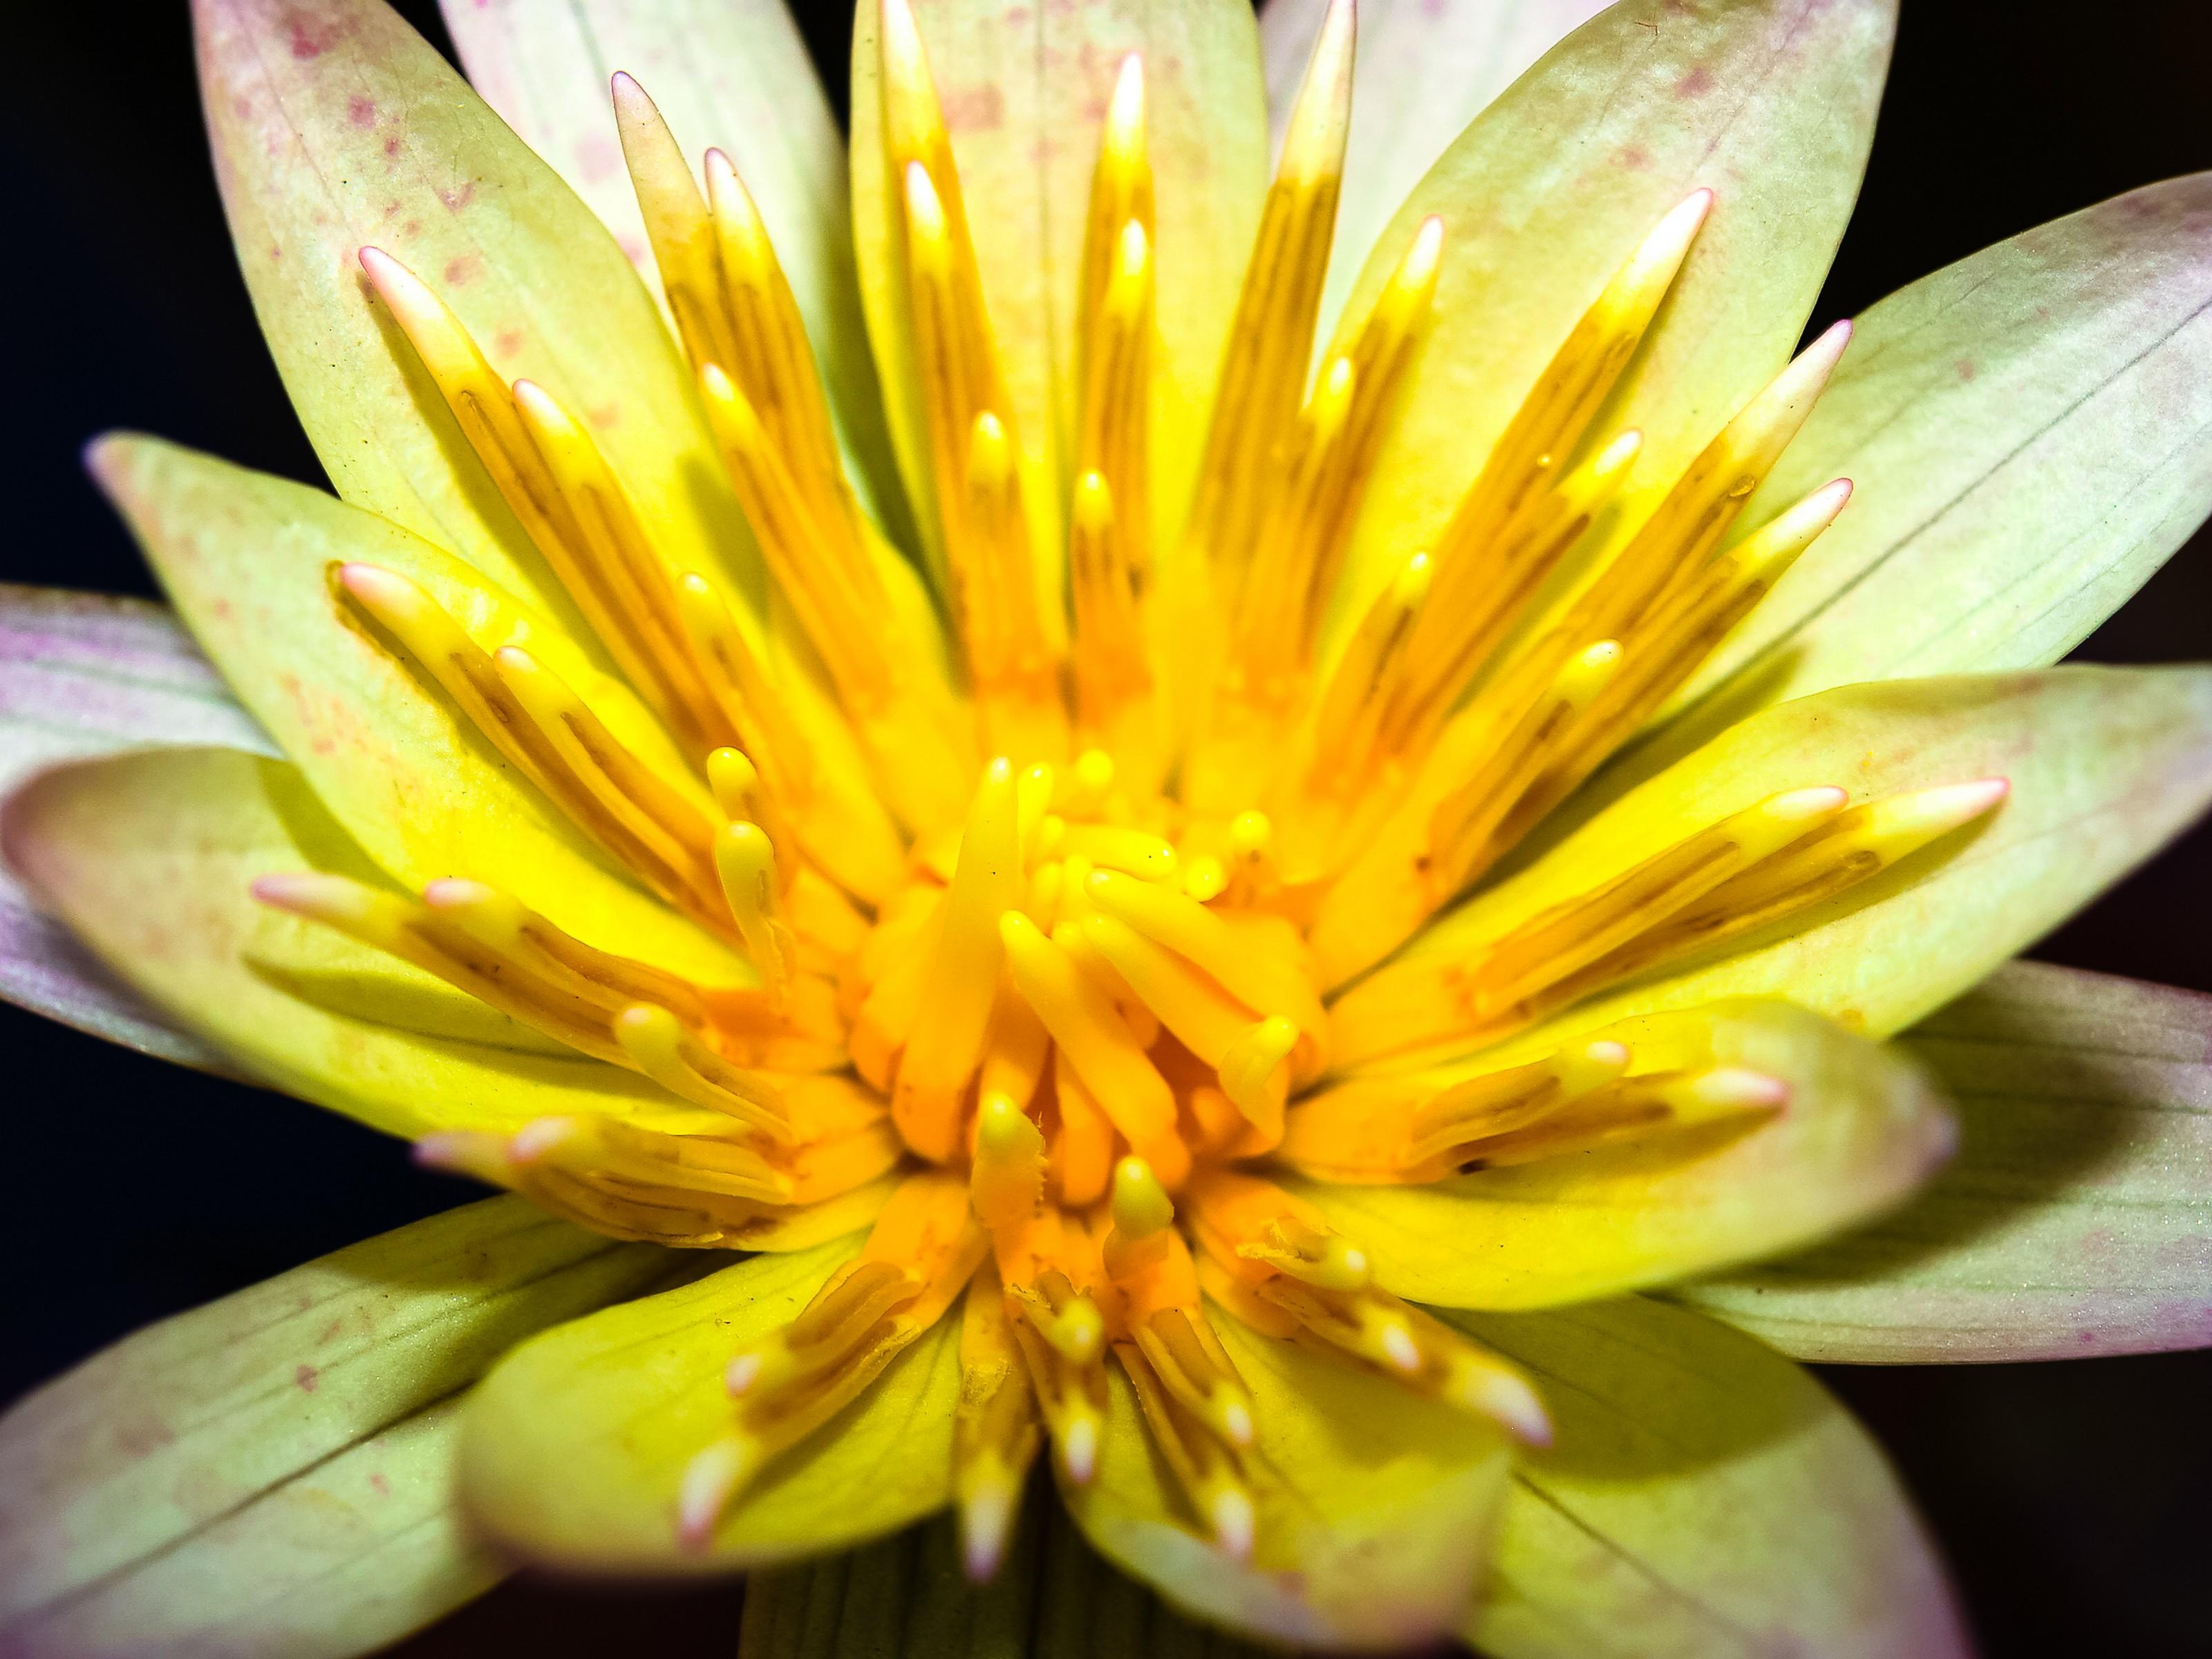 Gratis billeder : blomst, blå, botanisk, lyse, lyst, farve, farvet ...